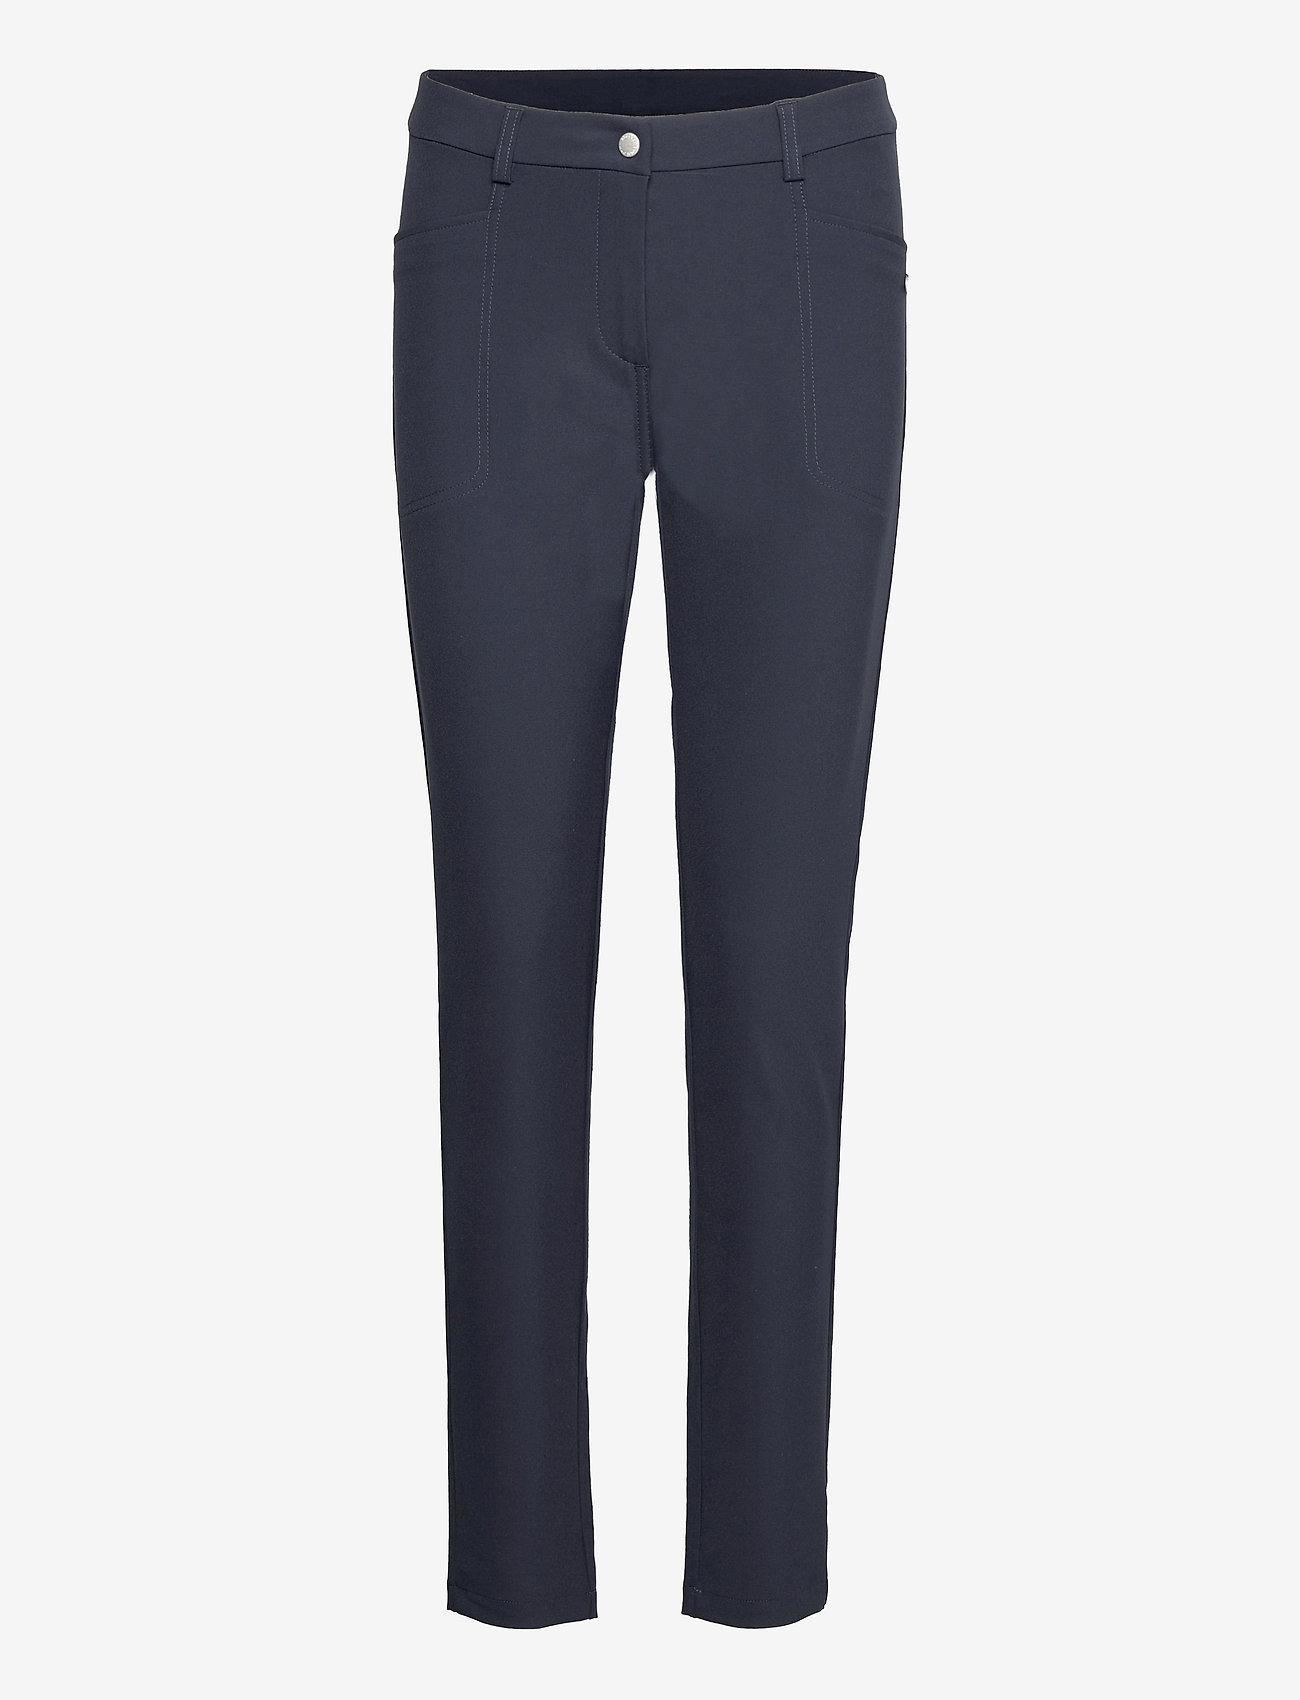 Abacus - Lds Grace trousers 103cm - golfbroeken - navy - 0